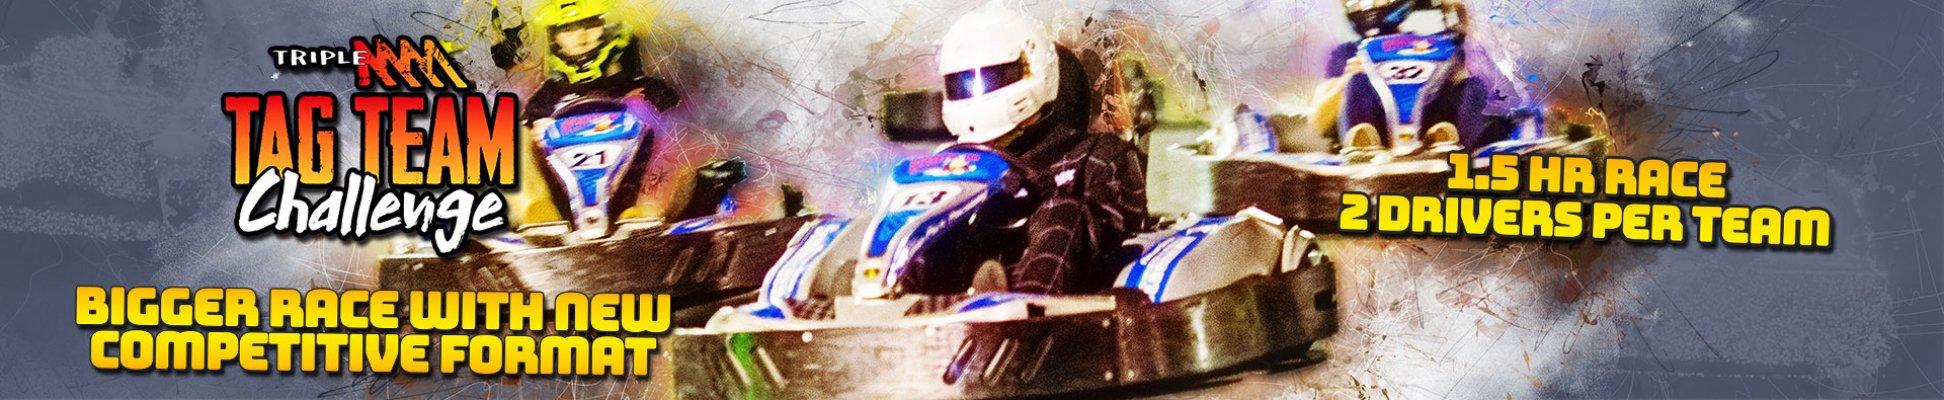 Tag Team Go kart Challenge